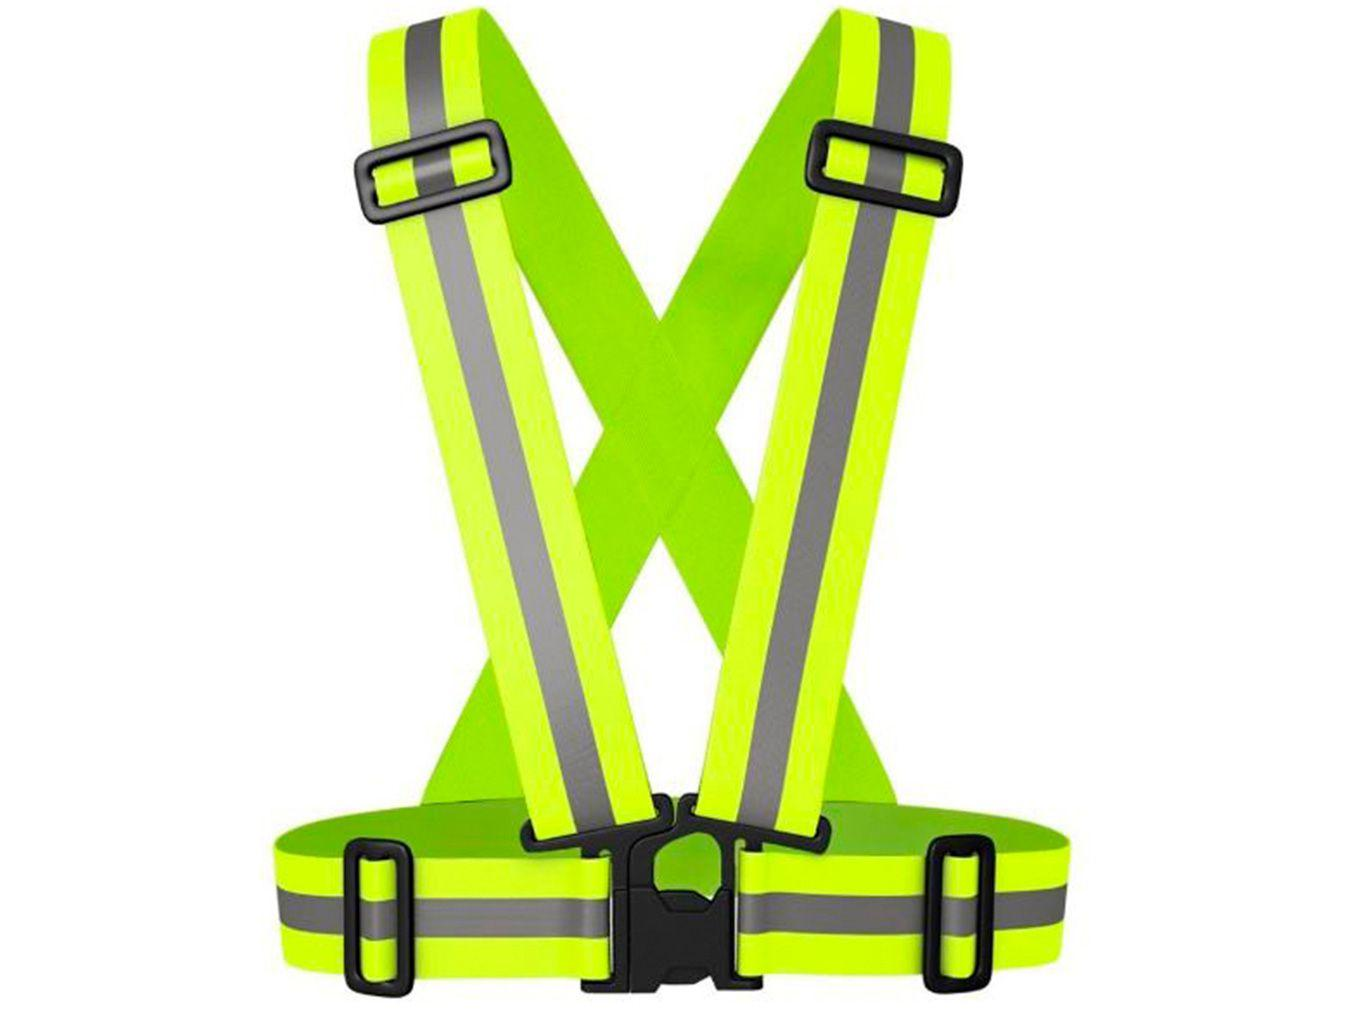 Colete Refletivo para Ciclista Tipo X Verde - Acte Sports A78